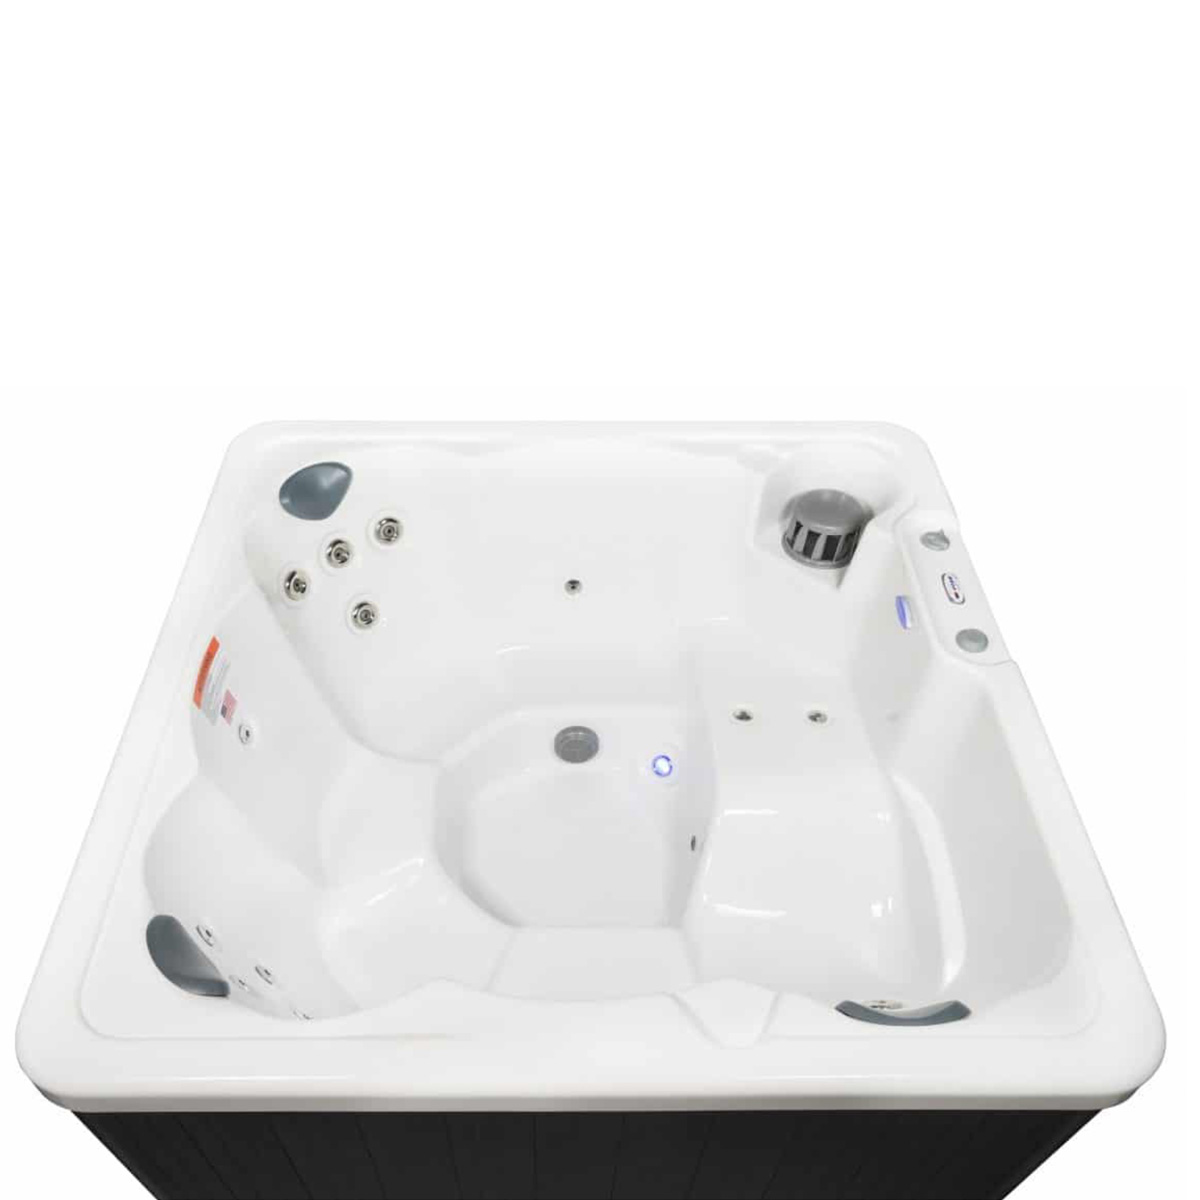 Malibu - Online Hot Tub Specials - The Great Escape